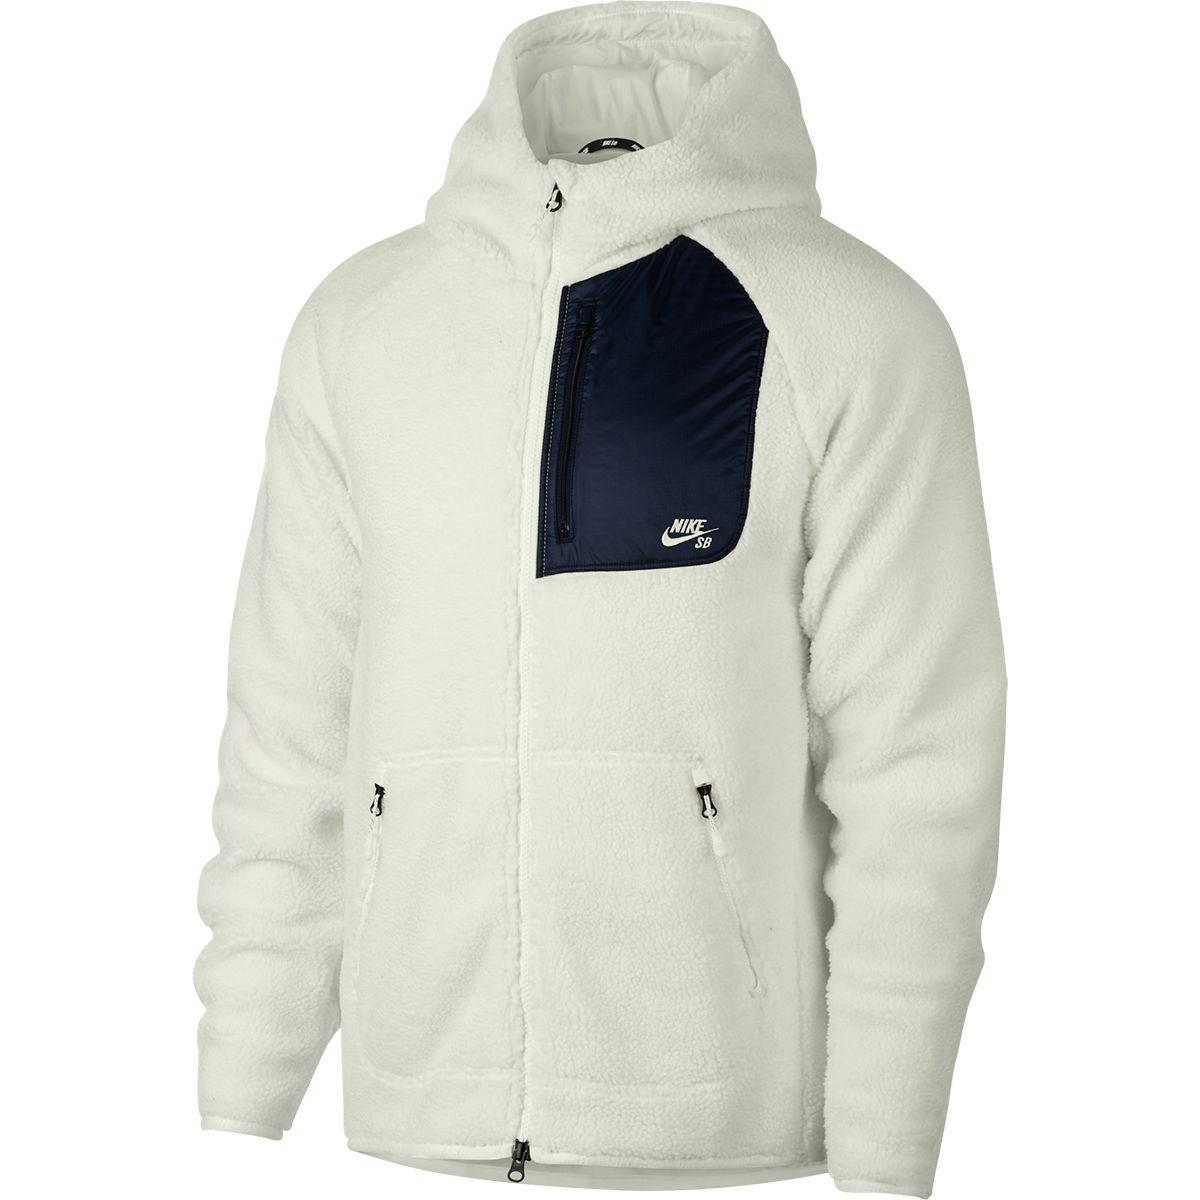 san francisco newest buy cheap Sb Everett Sherpa Full-zip Hoodie